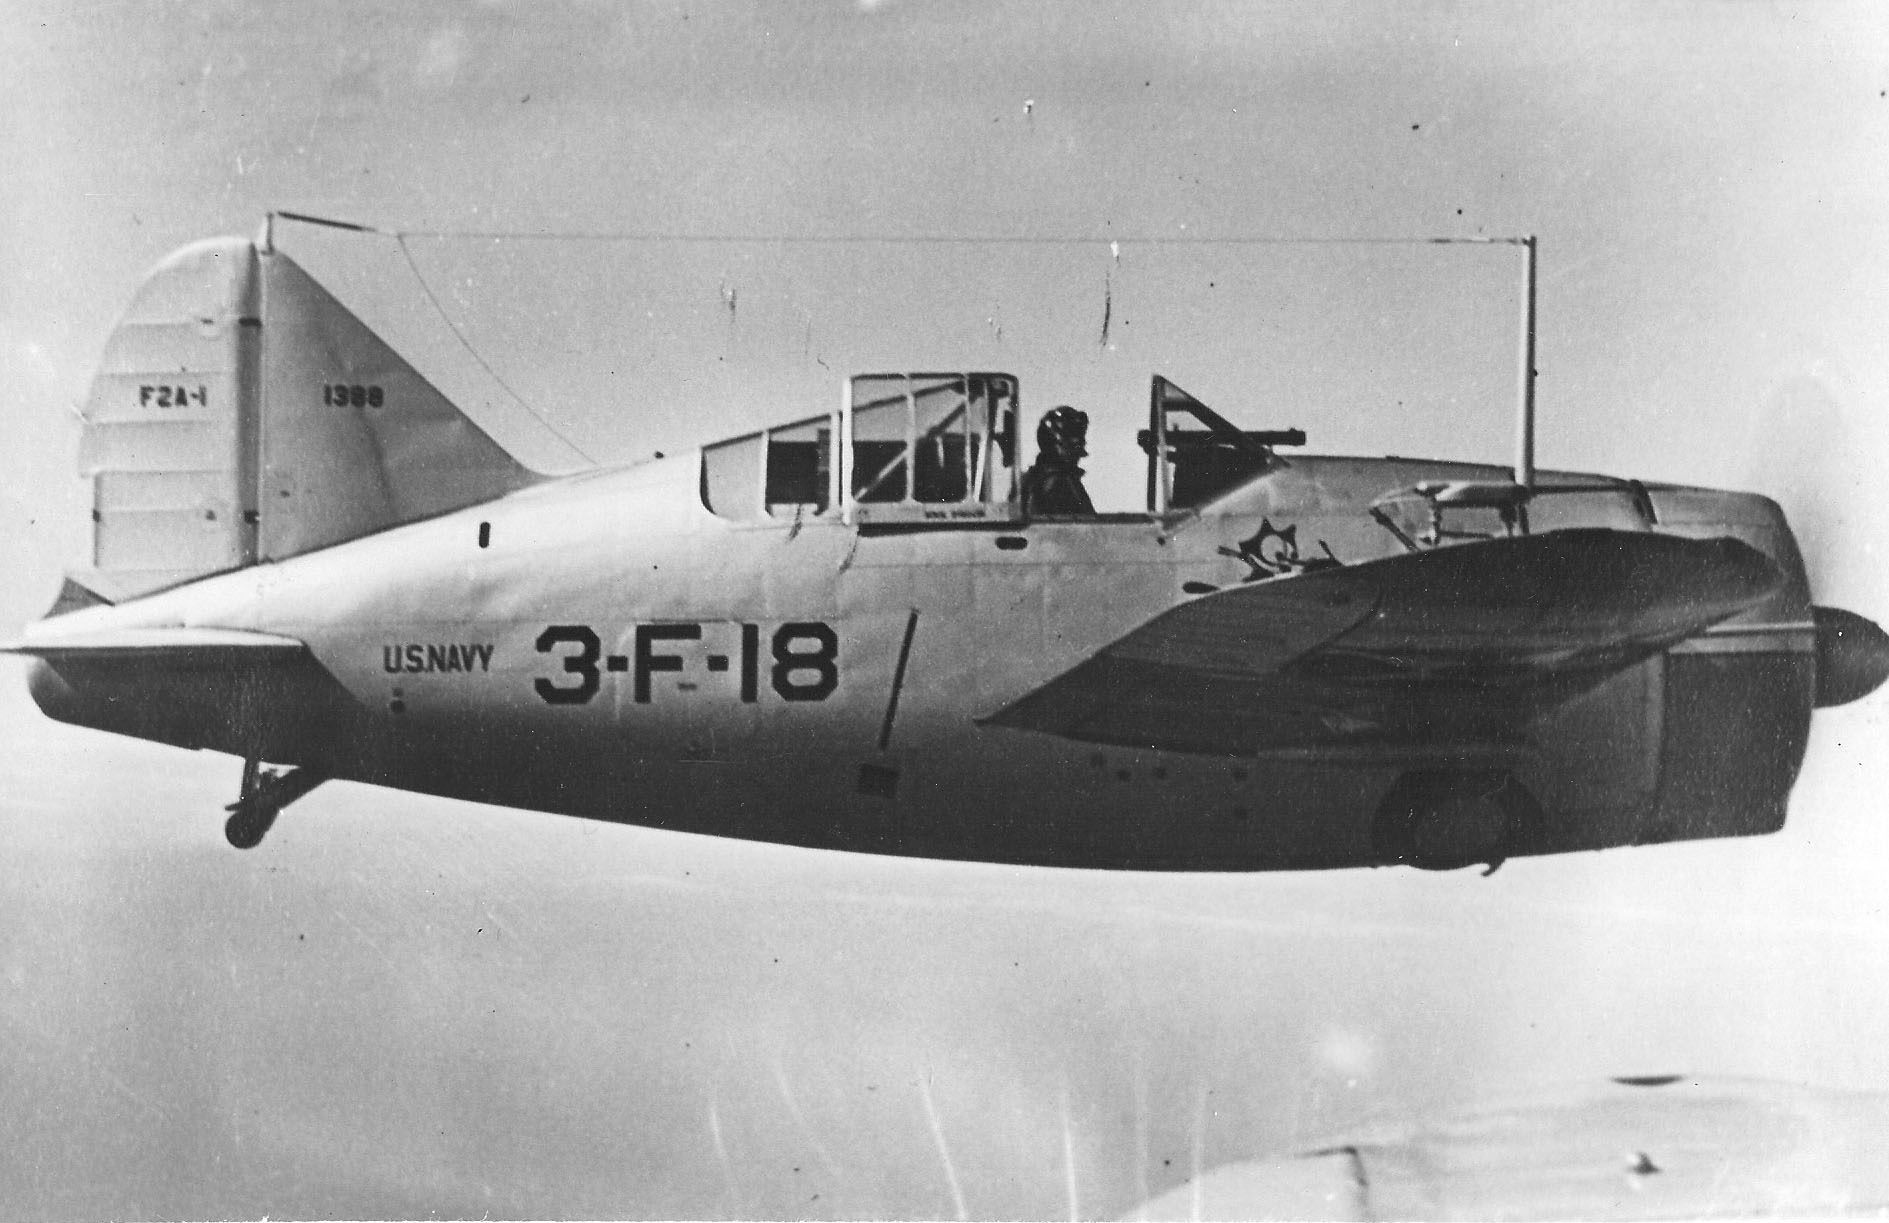 Prewar scheme with a carrier group.